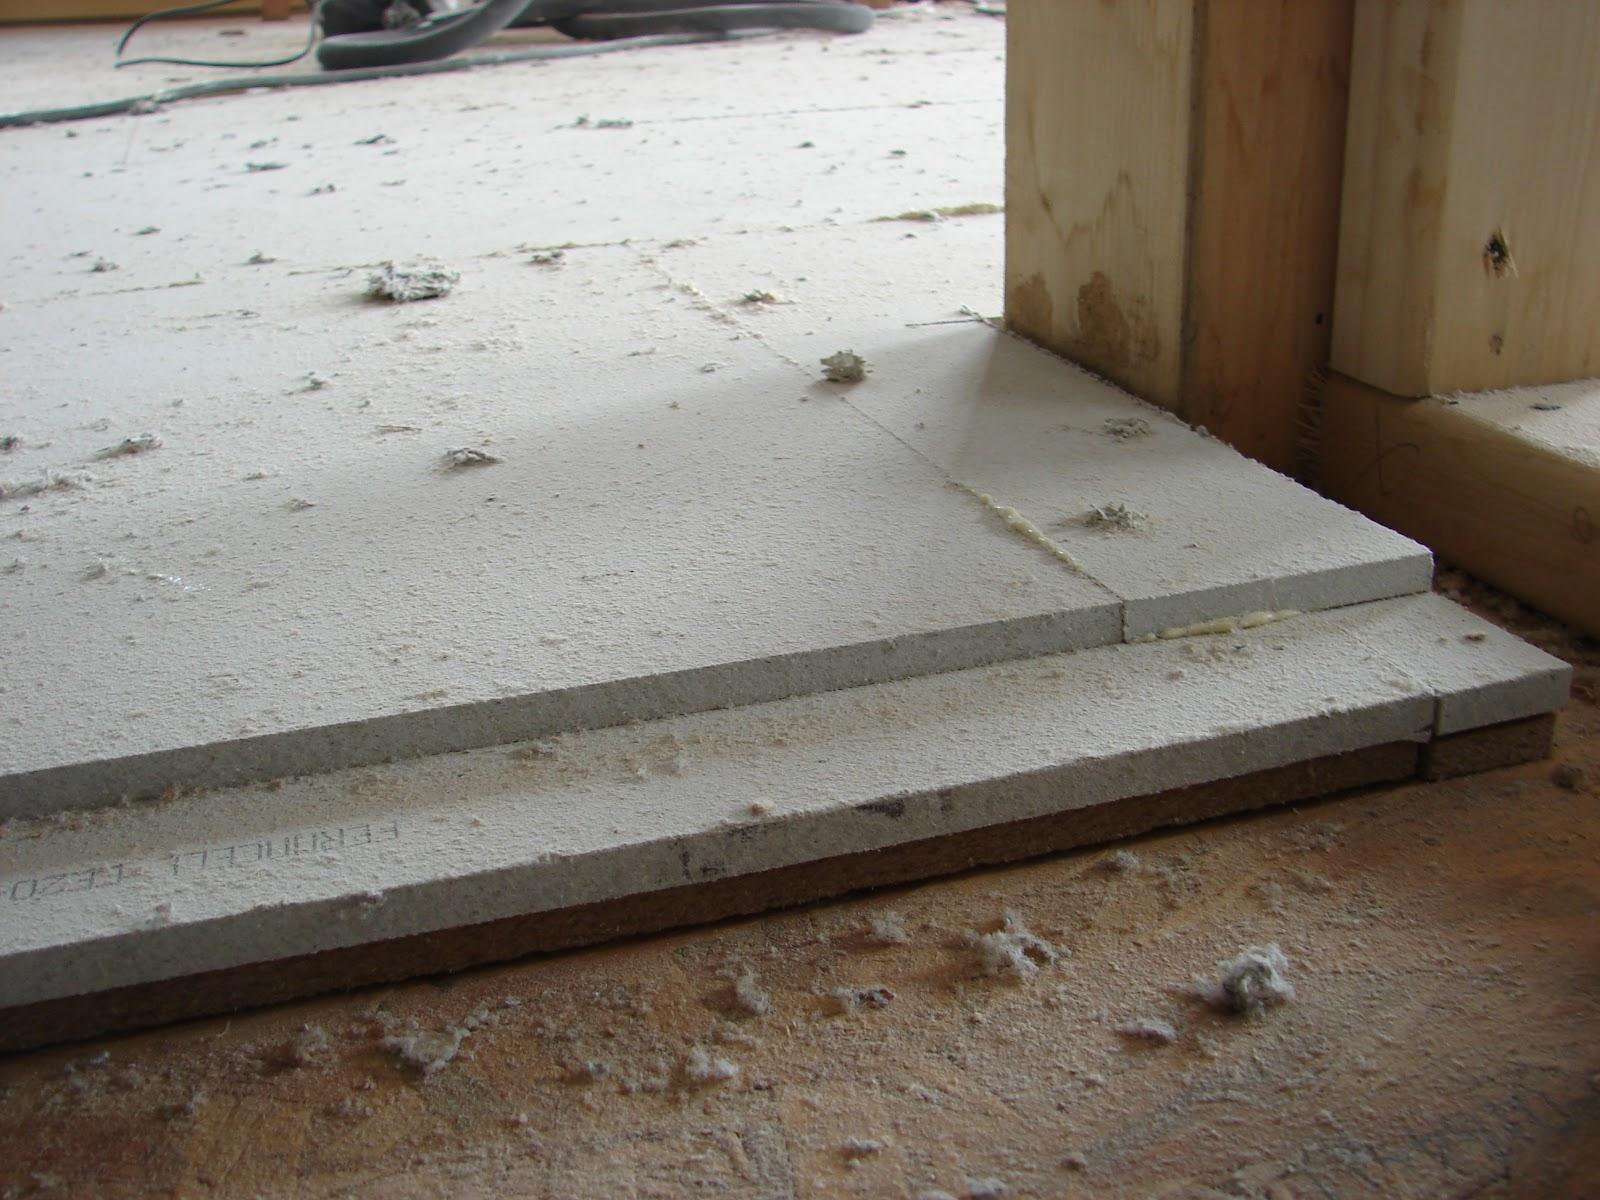 habitat bois entre les 2 phases d 39 isolation pose du fermacell sol. Black Bedroom Furniture Sets. Home Design Ideas